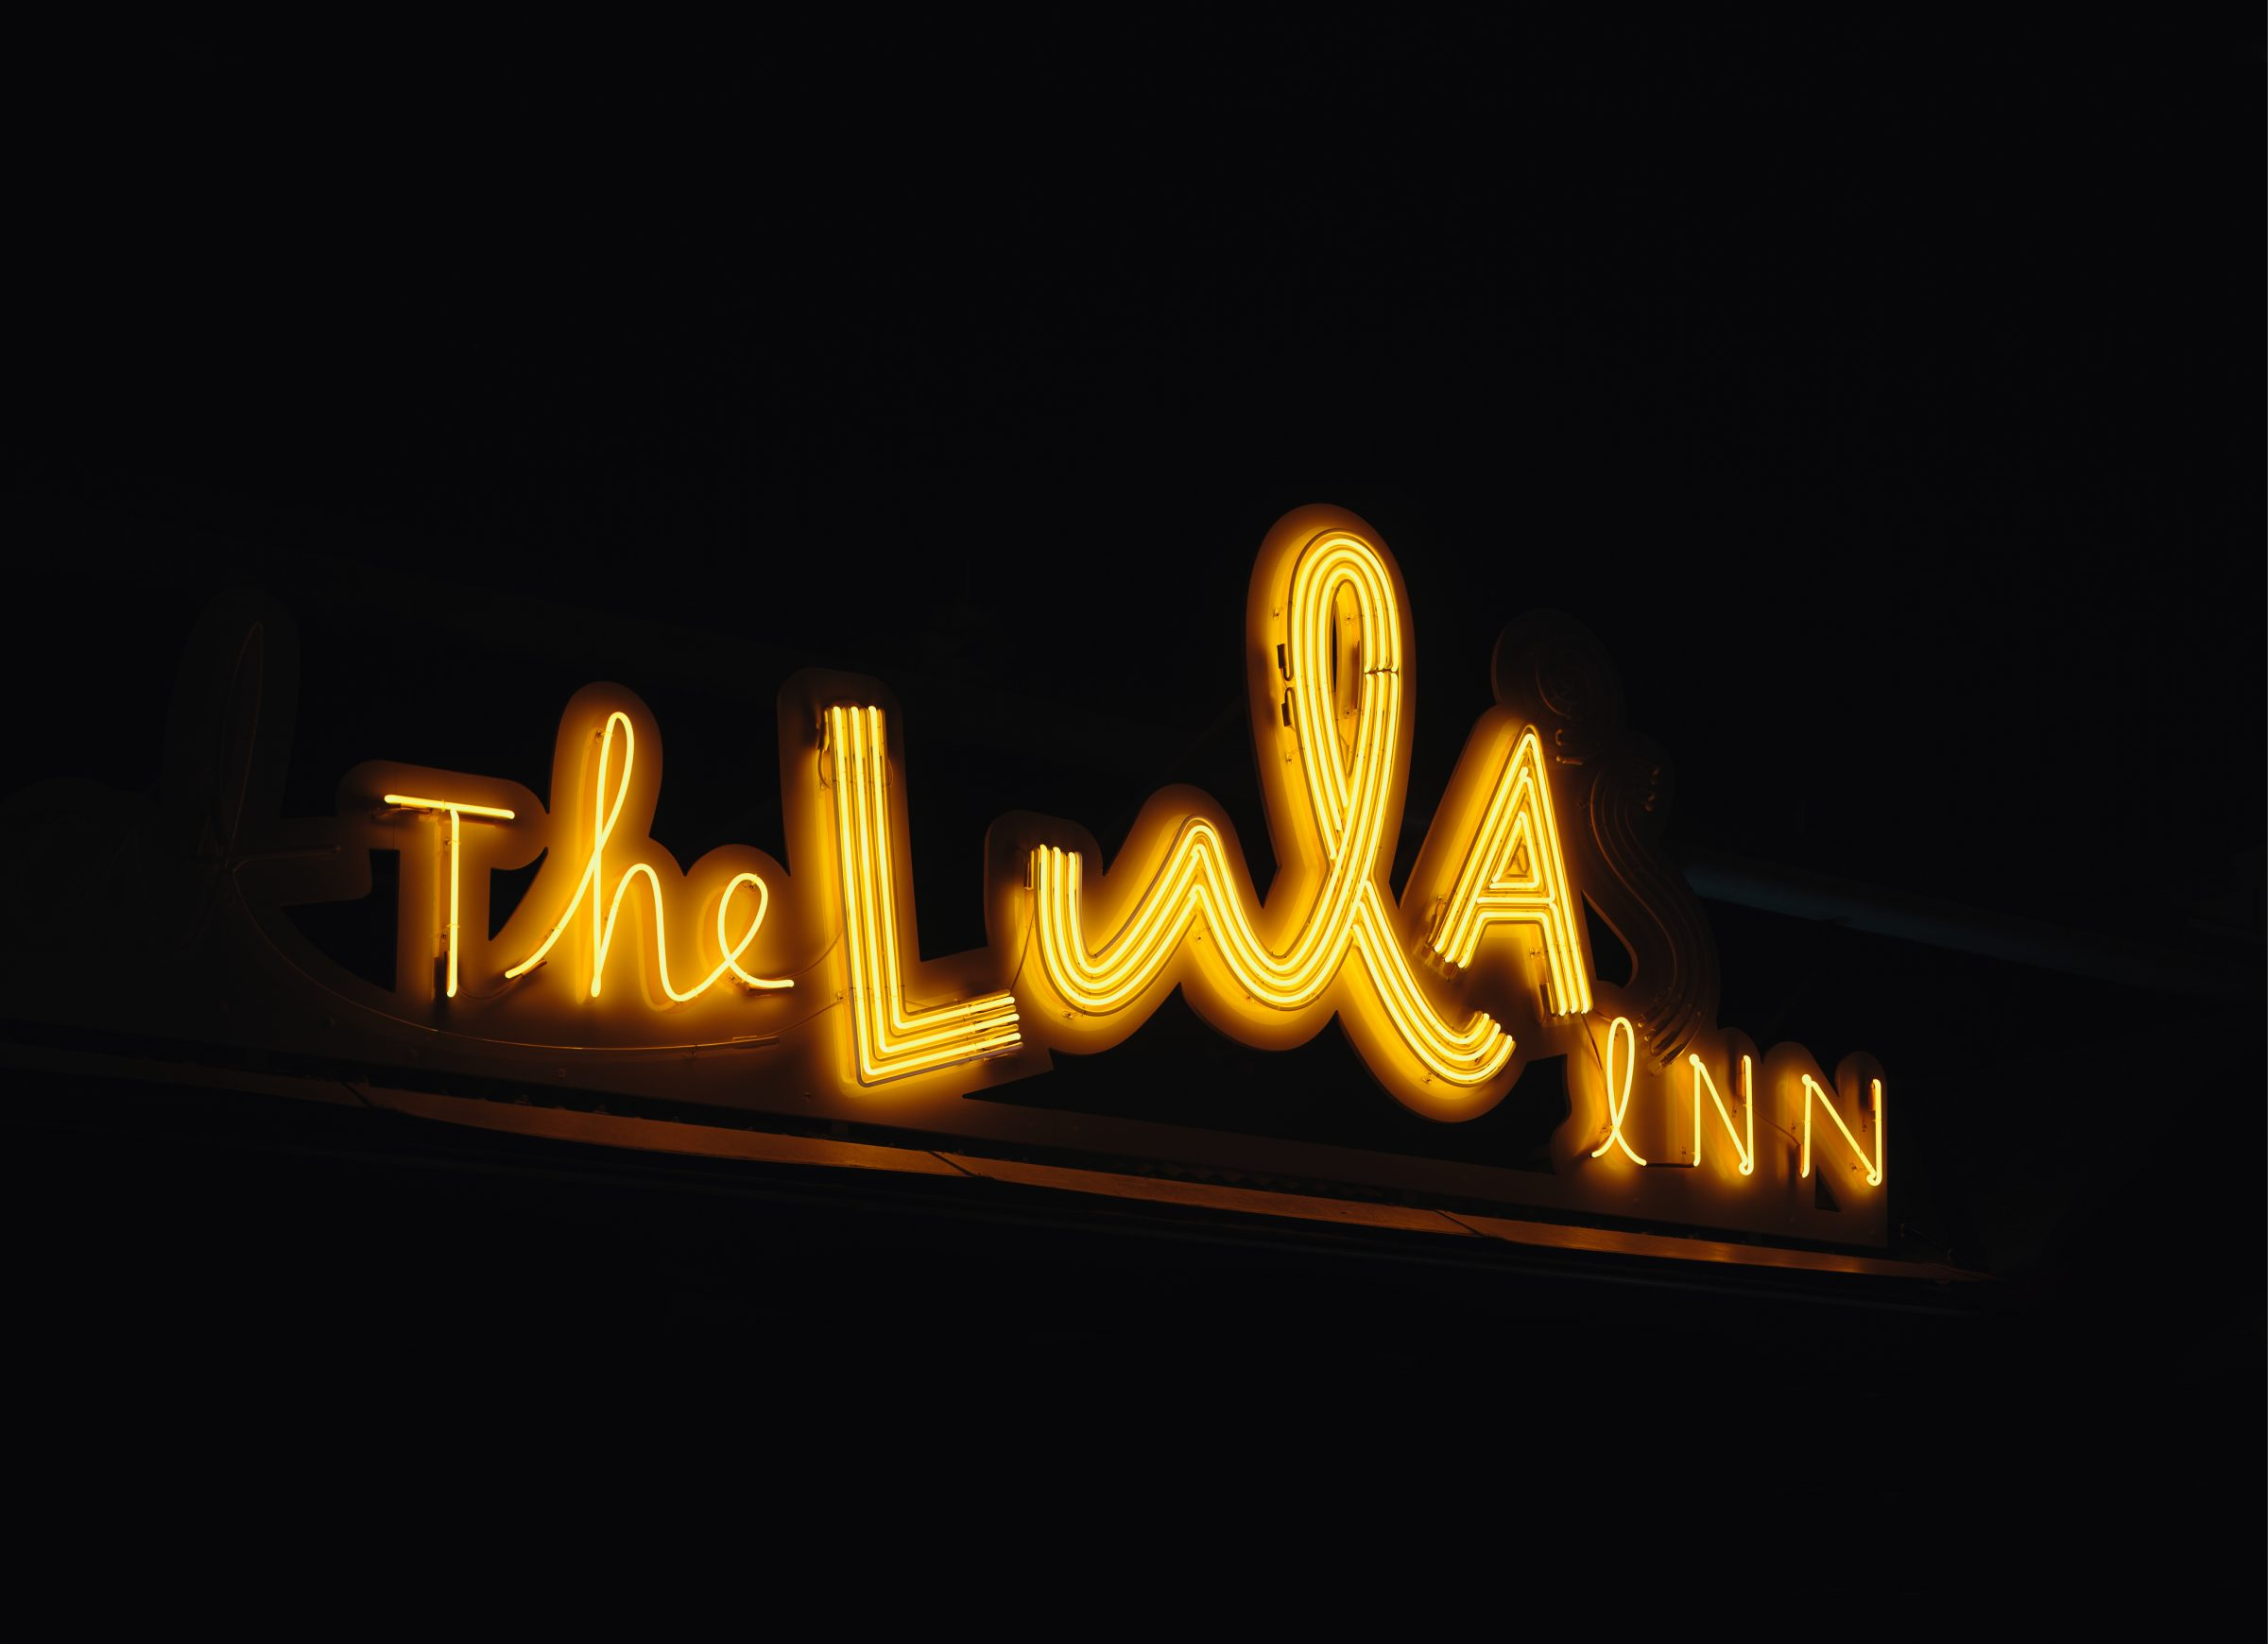 https://tanamitchell.com/wp-content/uploads/2019/01/Lula-Inn-2000x1450px-2400x1740.jpg